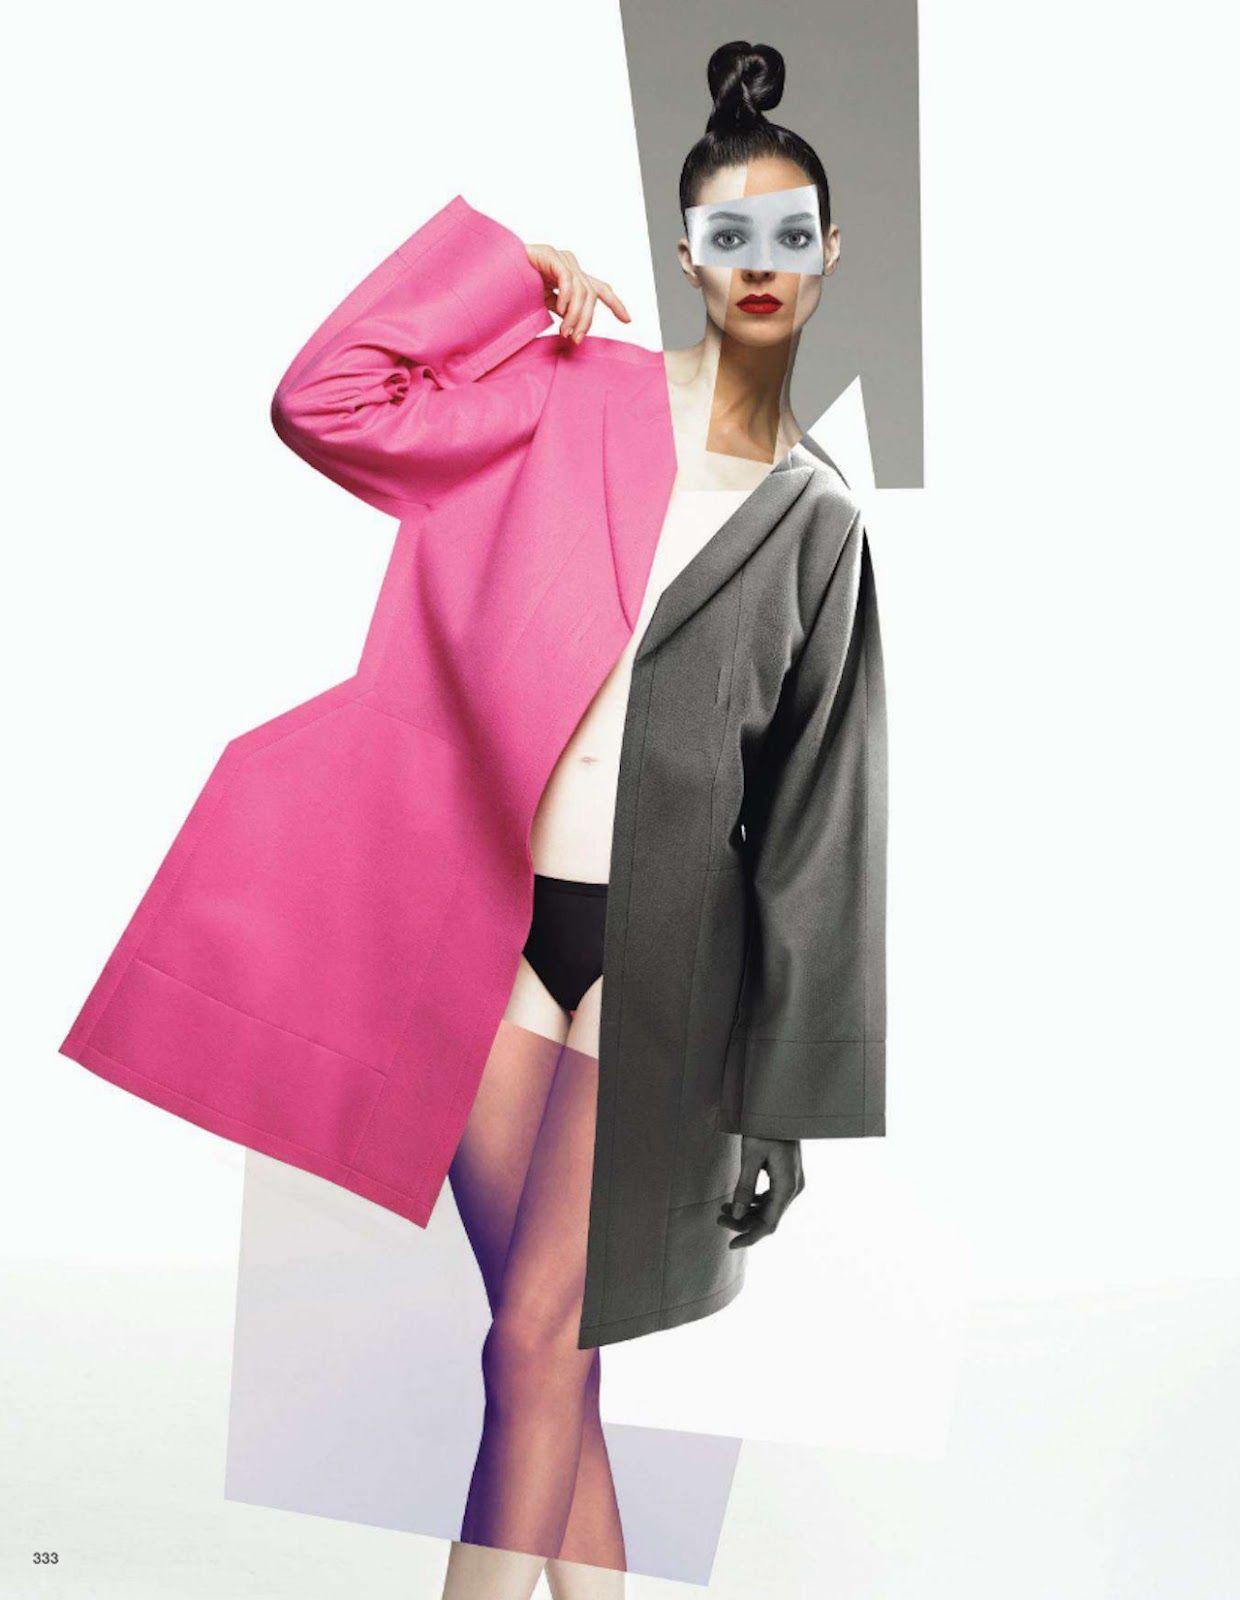 organic neo-tech: kati nescher by solve sundsbo for vogue japan october 2012